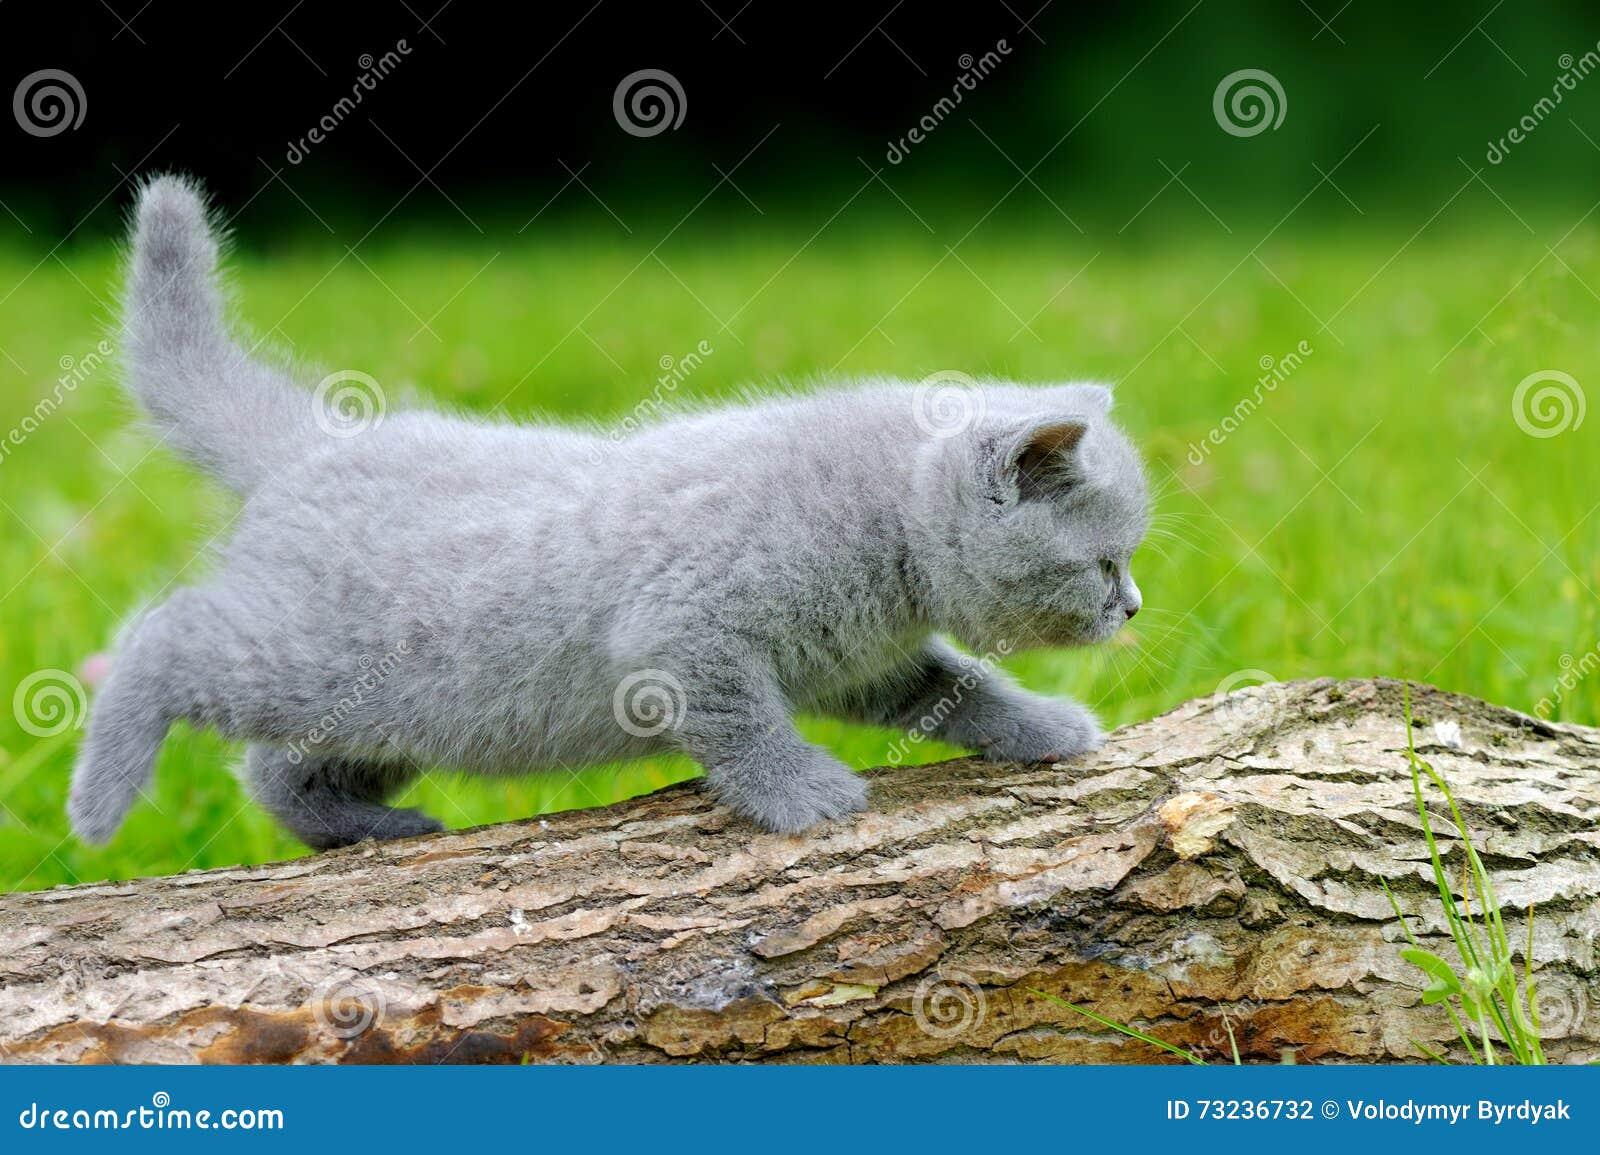 White Cat Fur Turning Yellow